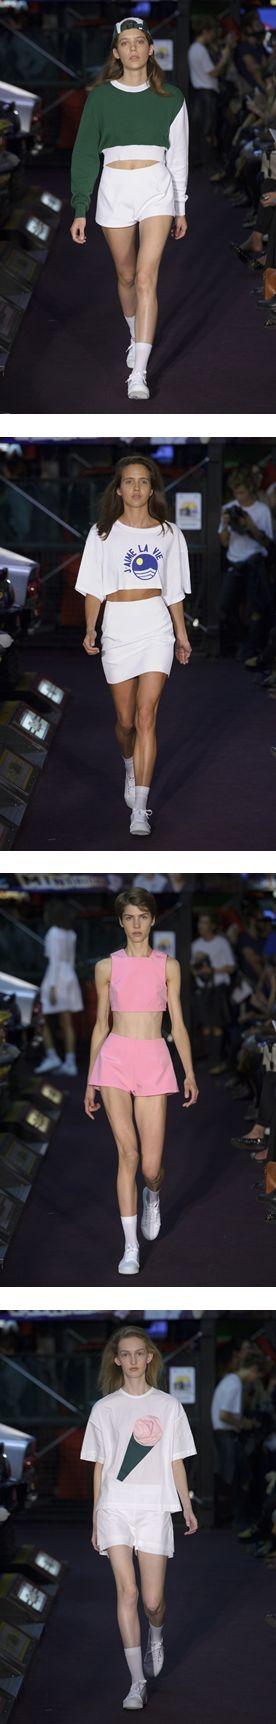 Fashion week : collection Jacquemus